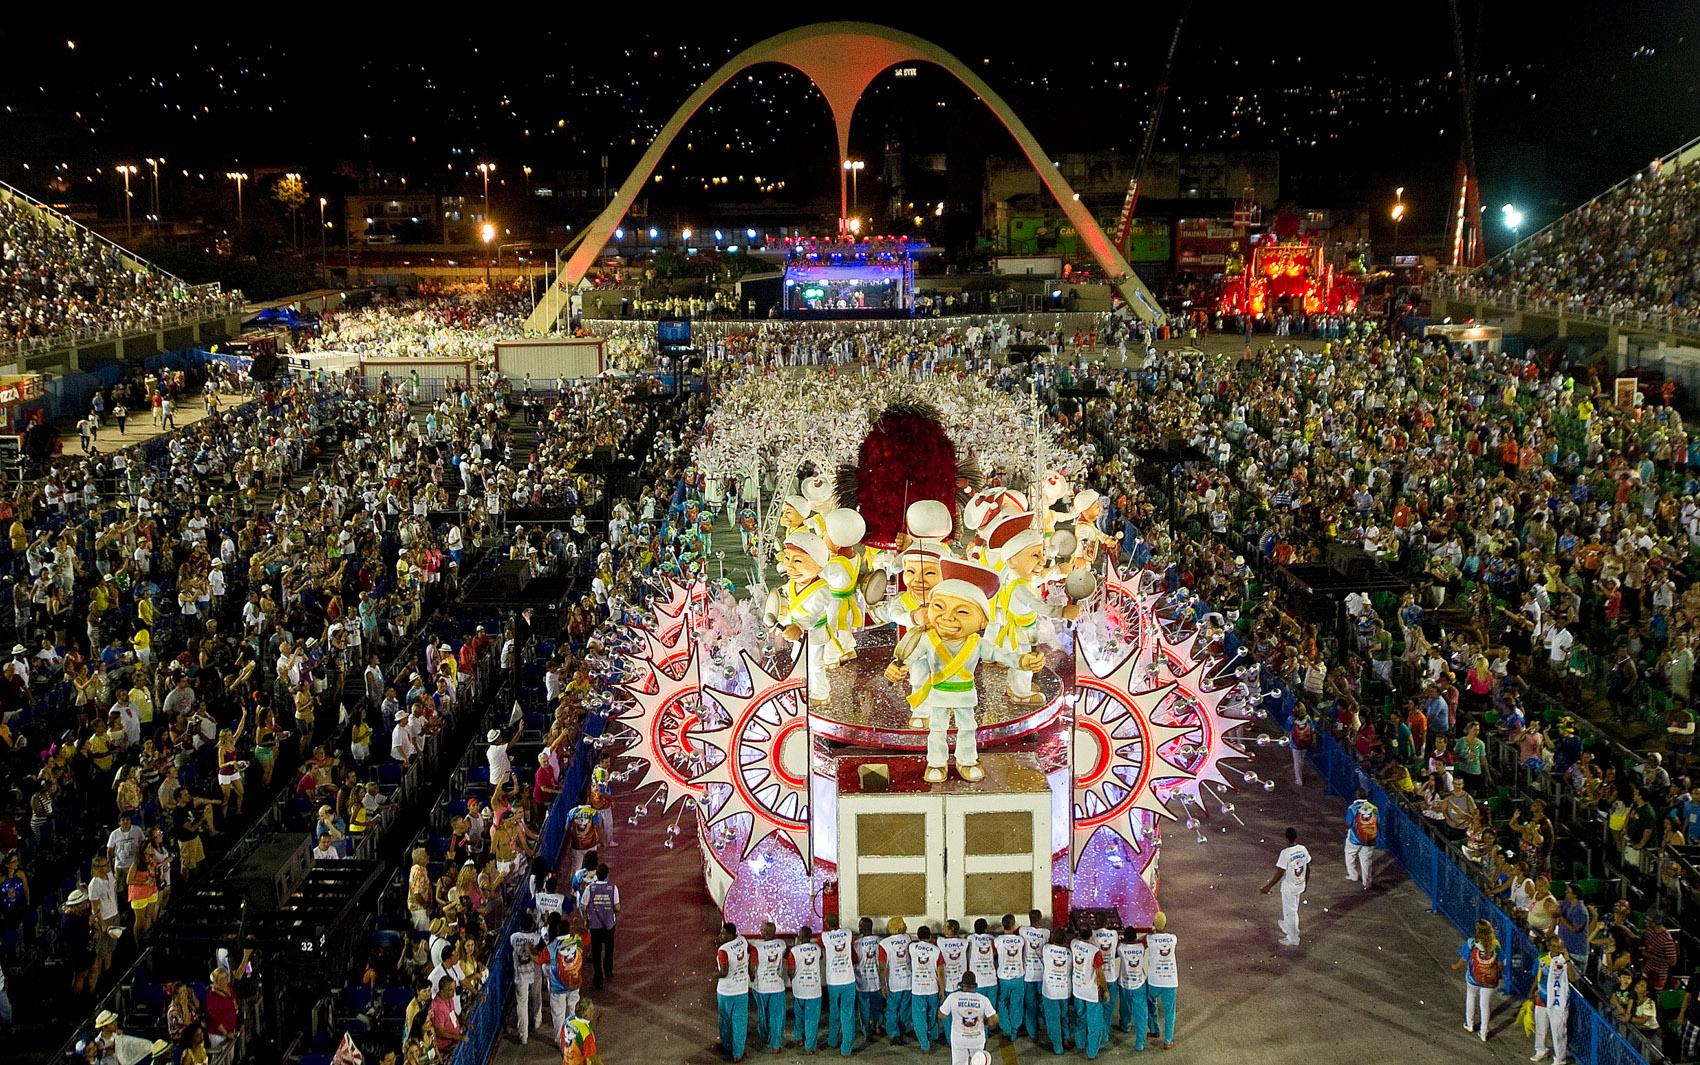 carnaval_de_rio 03.jpg